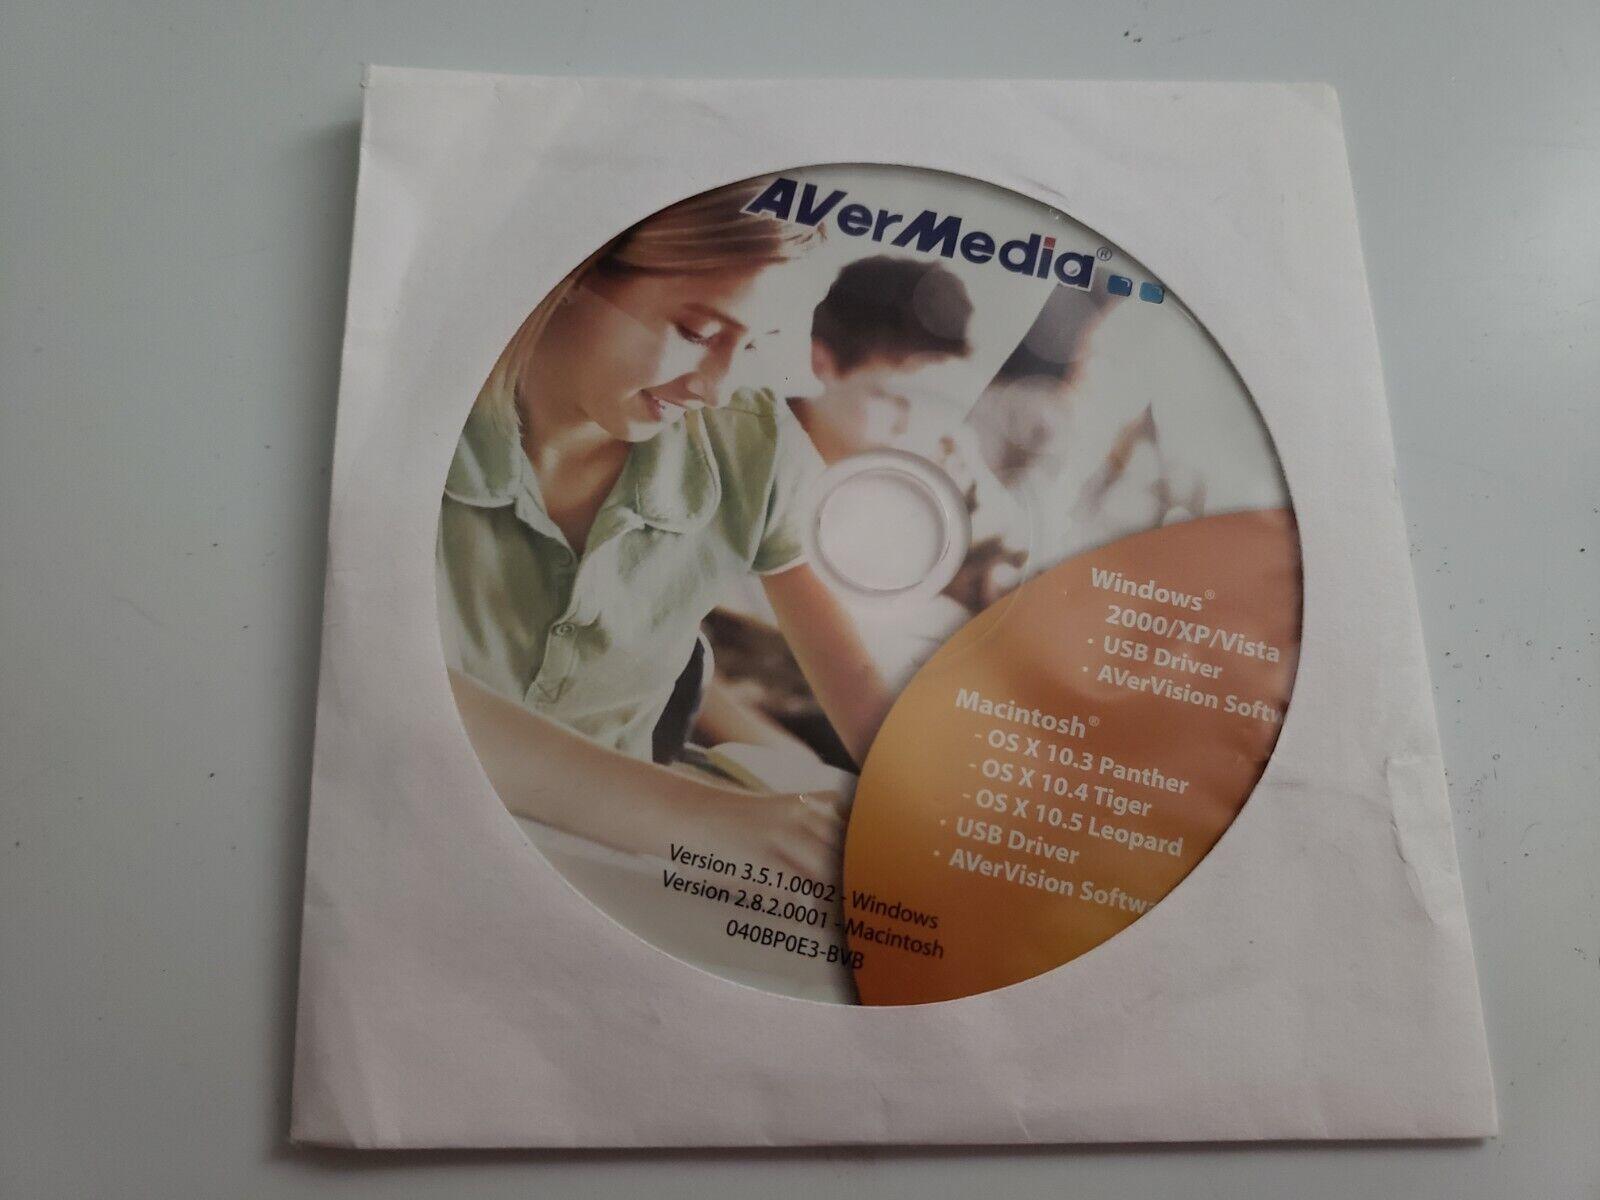 AVerMedia AVerVision Software CD Version 3.5.1 Windows 2000 XP Vista